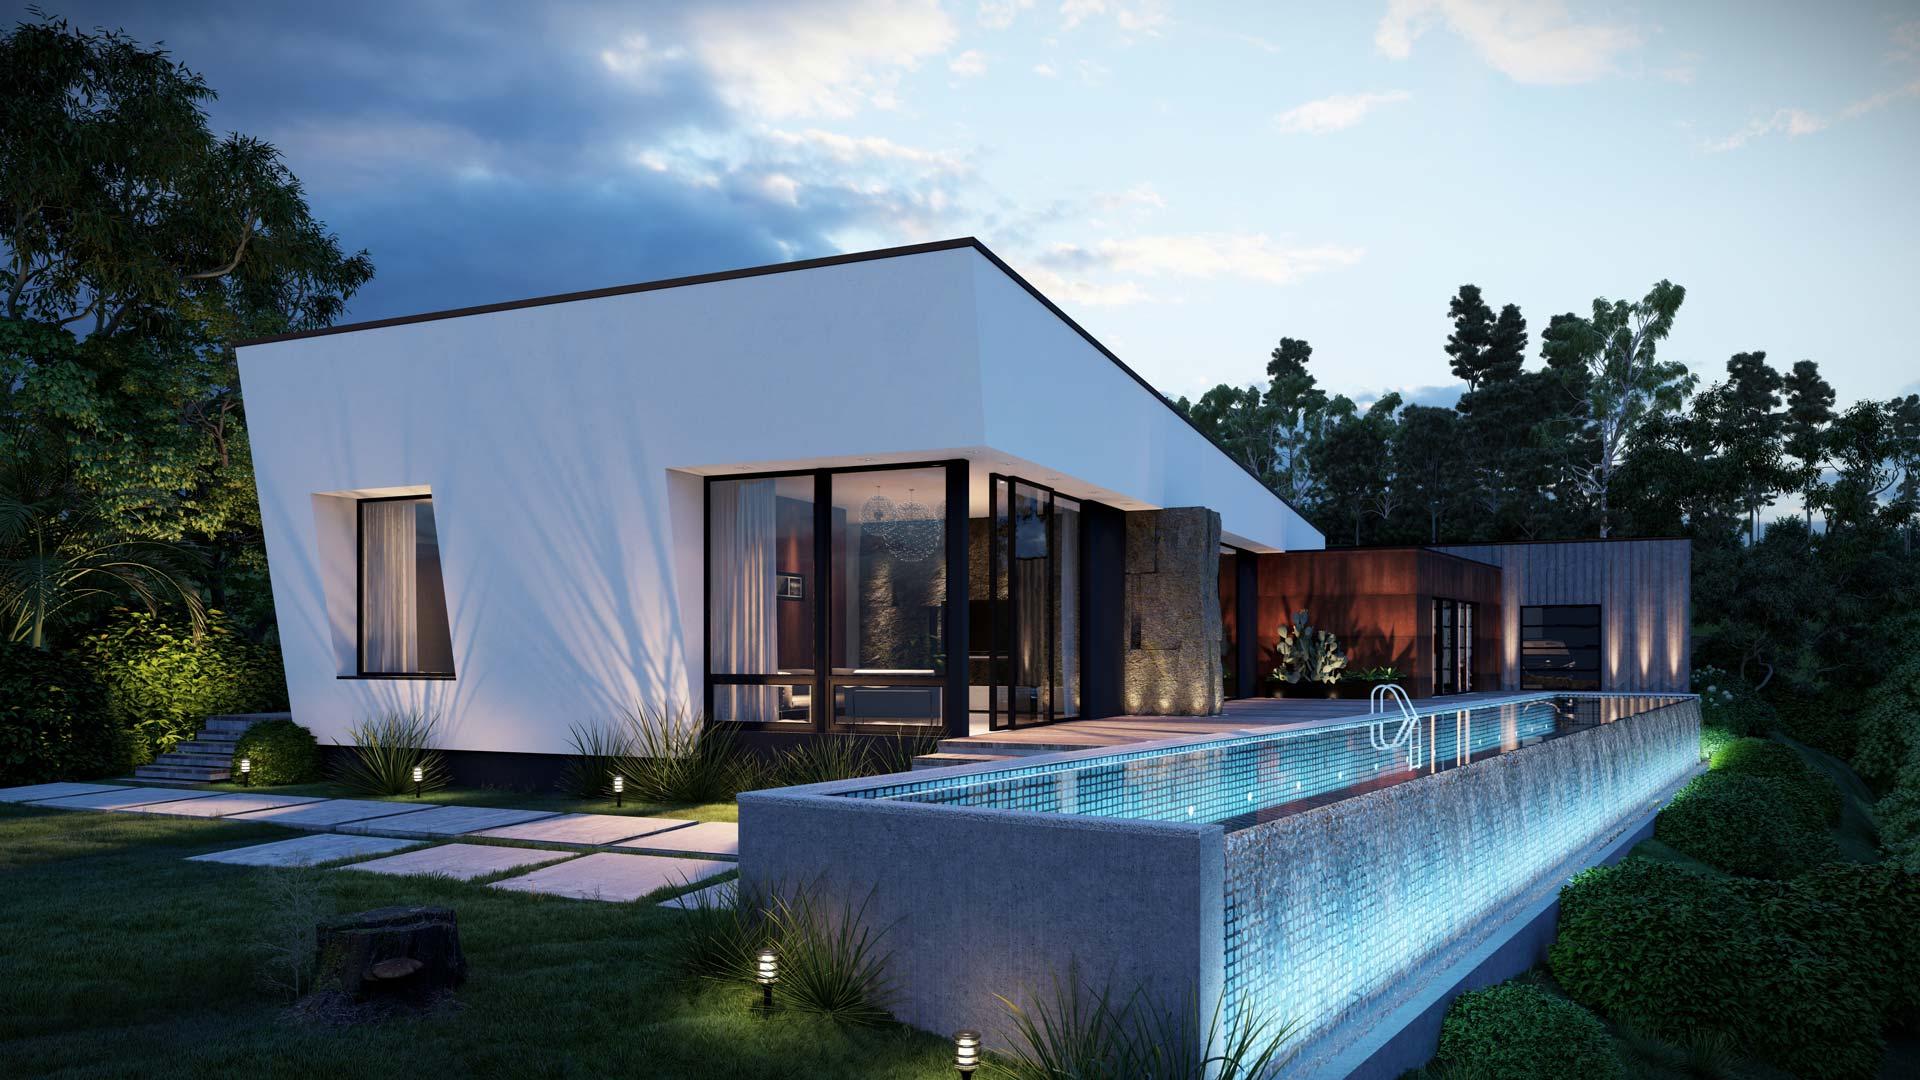 Viilla-pool-exterior-1920x1080_Lumion10_TenOverStudio-1